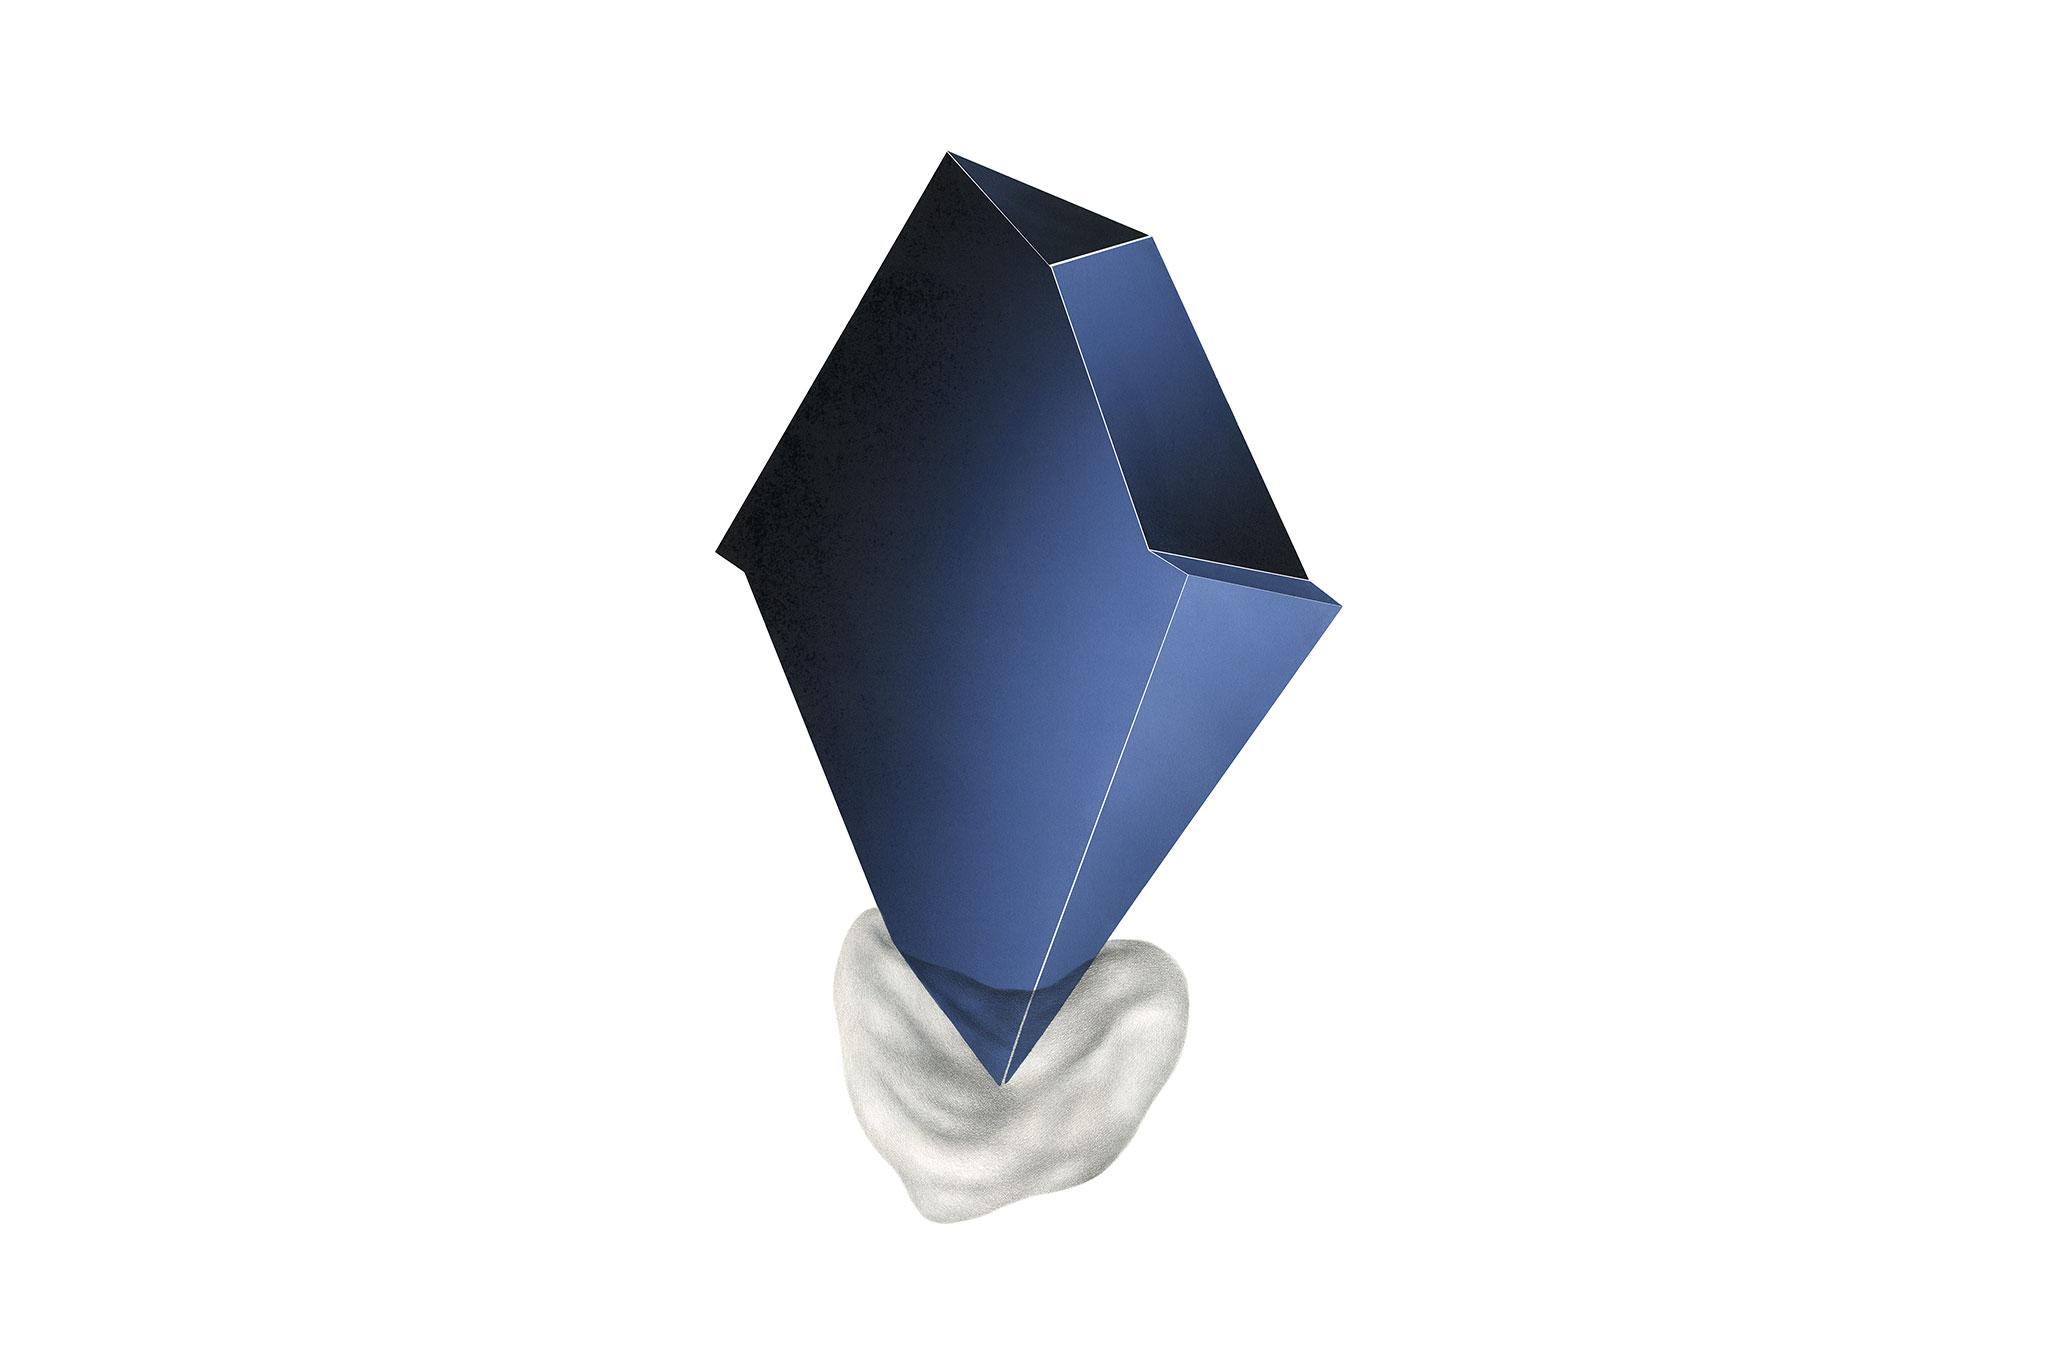 lenfer-festival-cabinet-mobi-dic-polygon